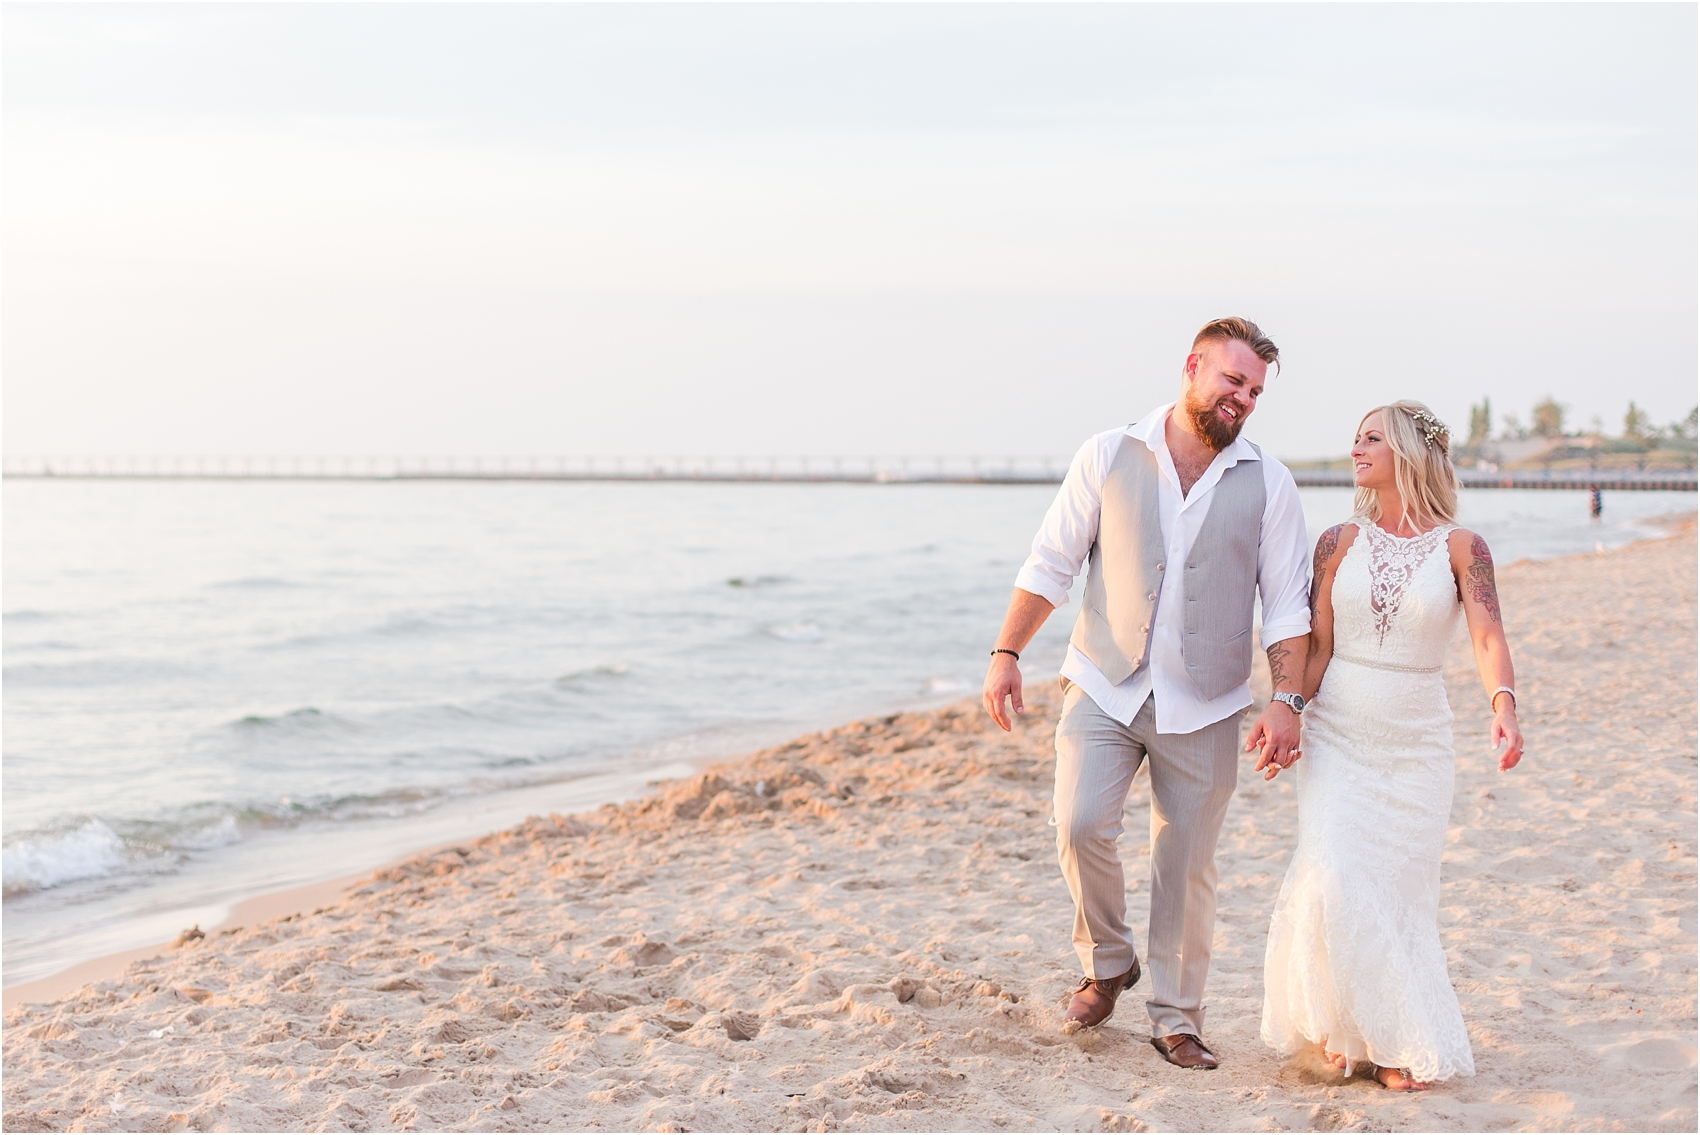 fun-whimsical-beach-wedding-photos-in-st-joseph-michigan-by-courtney-carolyn-photography_0102.jpg